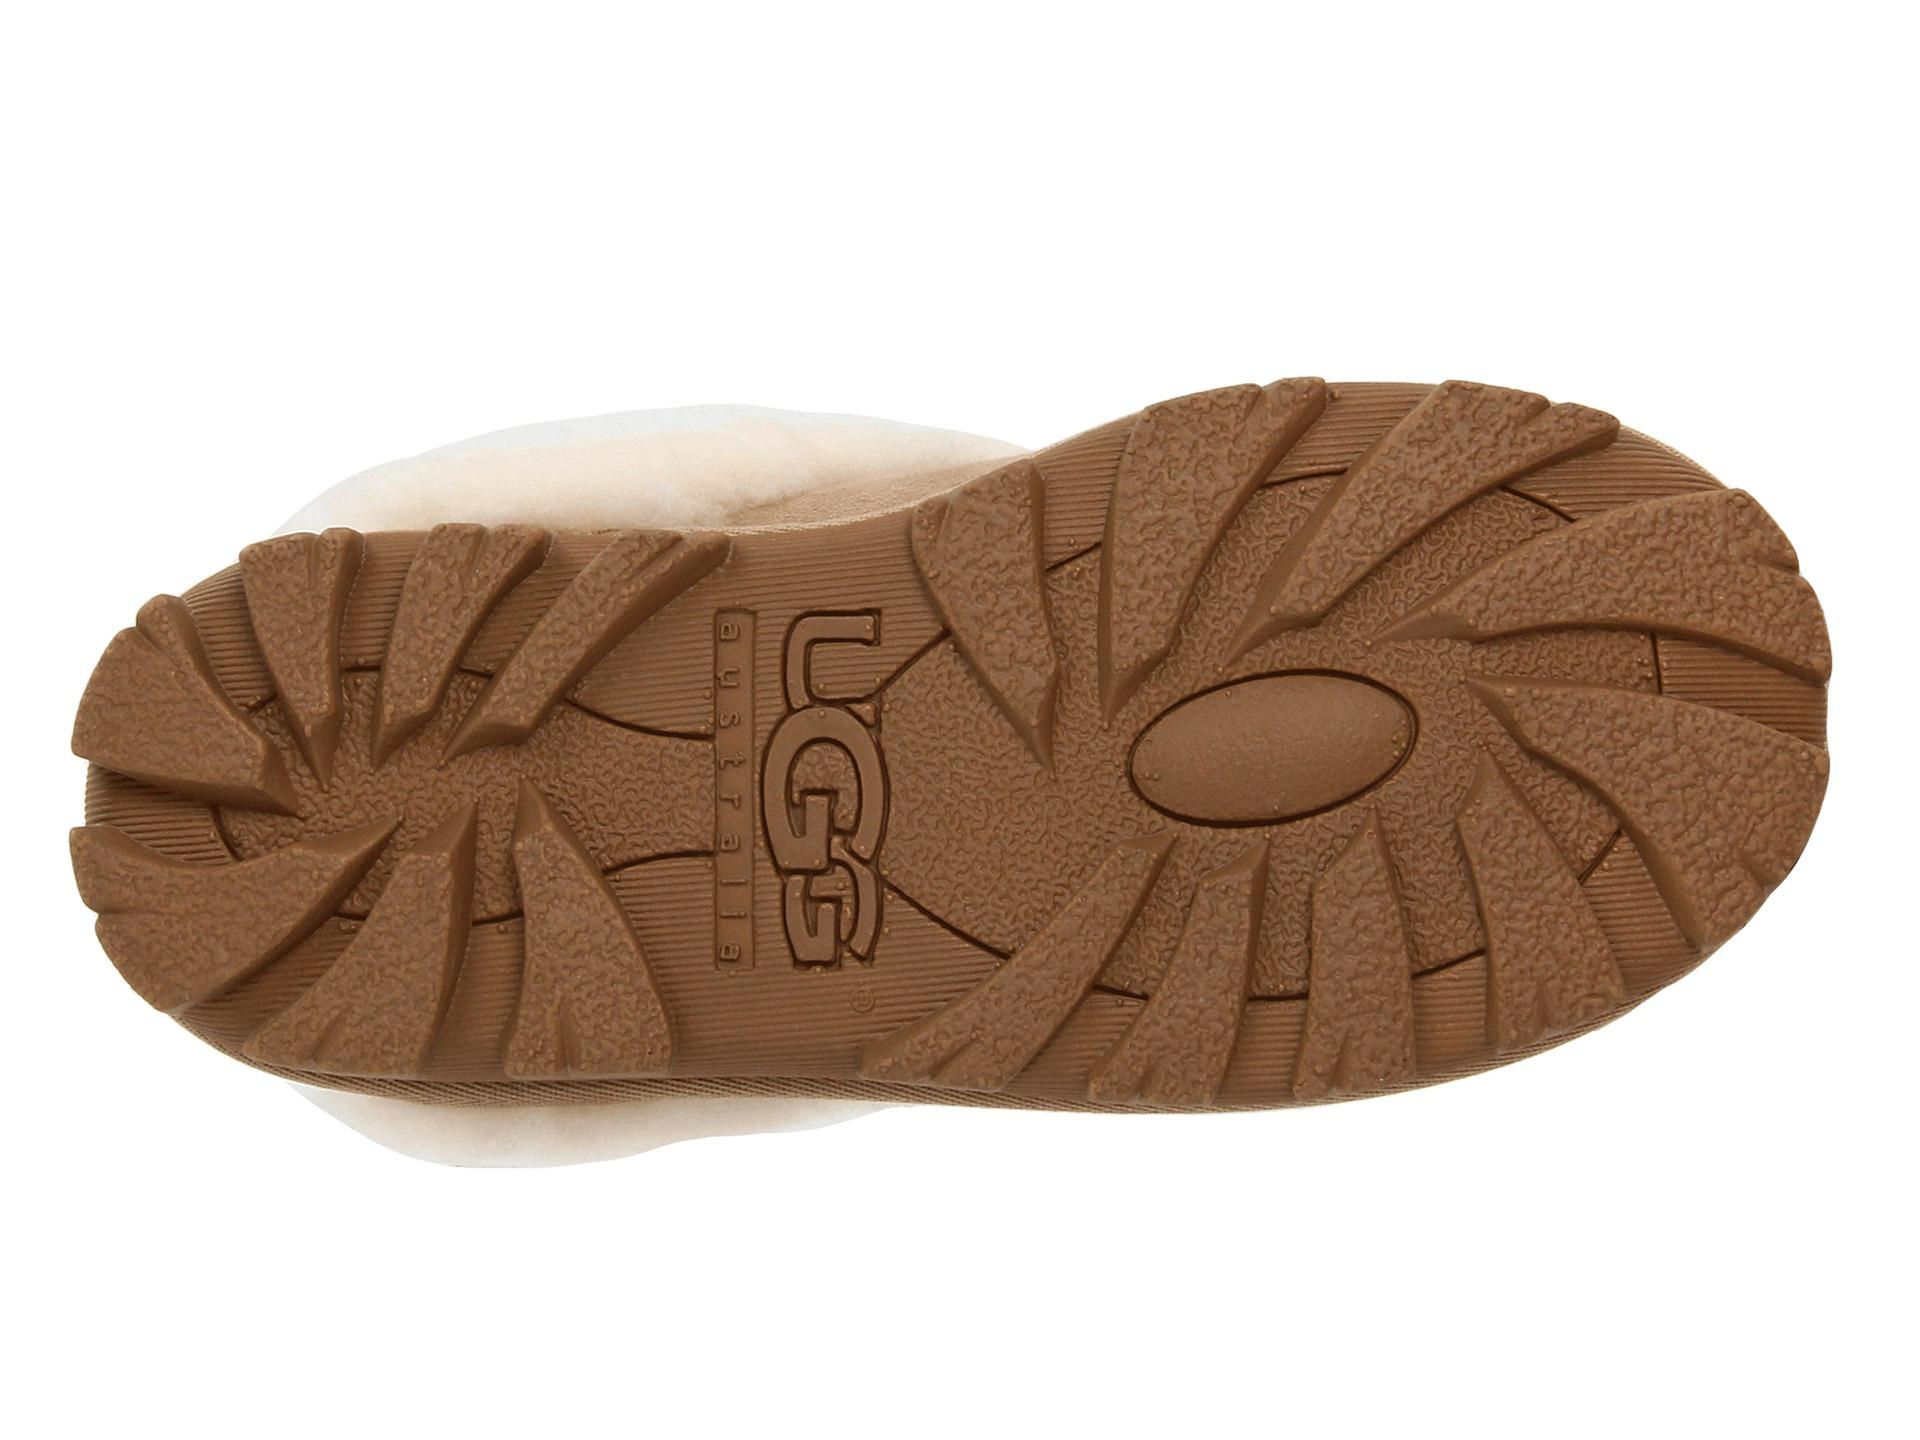 Ugg Coquette Sand Shoes | David Simchi-Levi